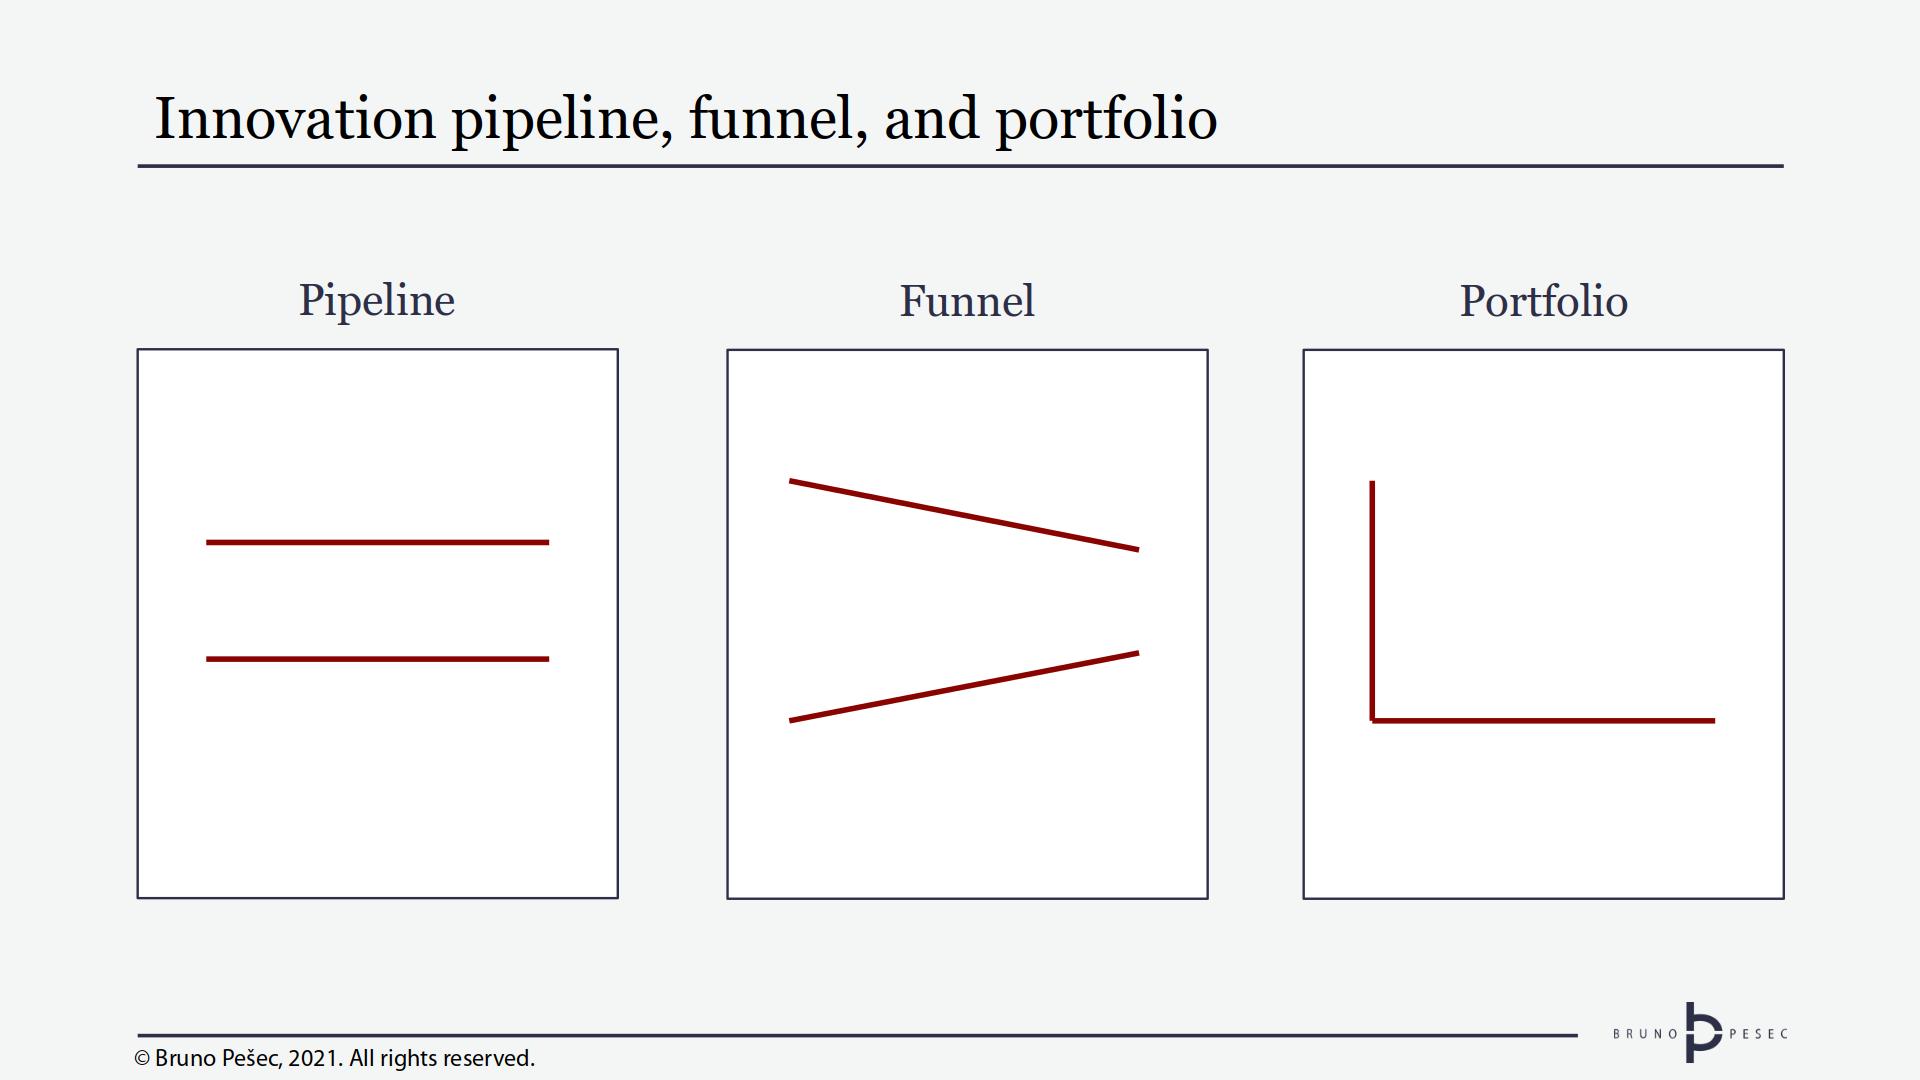 Innovation pipeline, funnel, and portfolio. © Bruno Pešec, 2021.